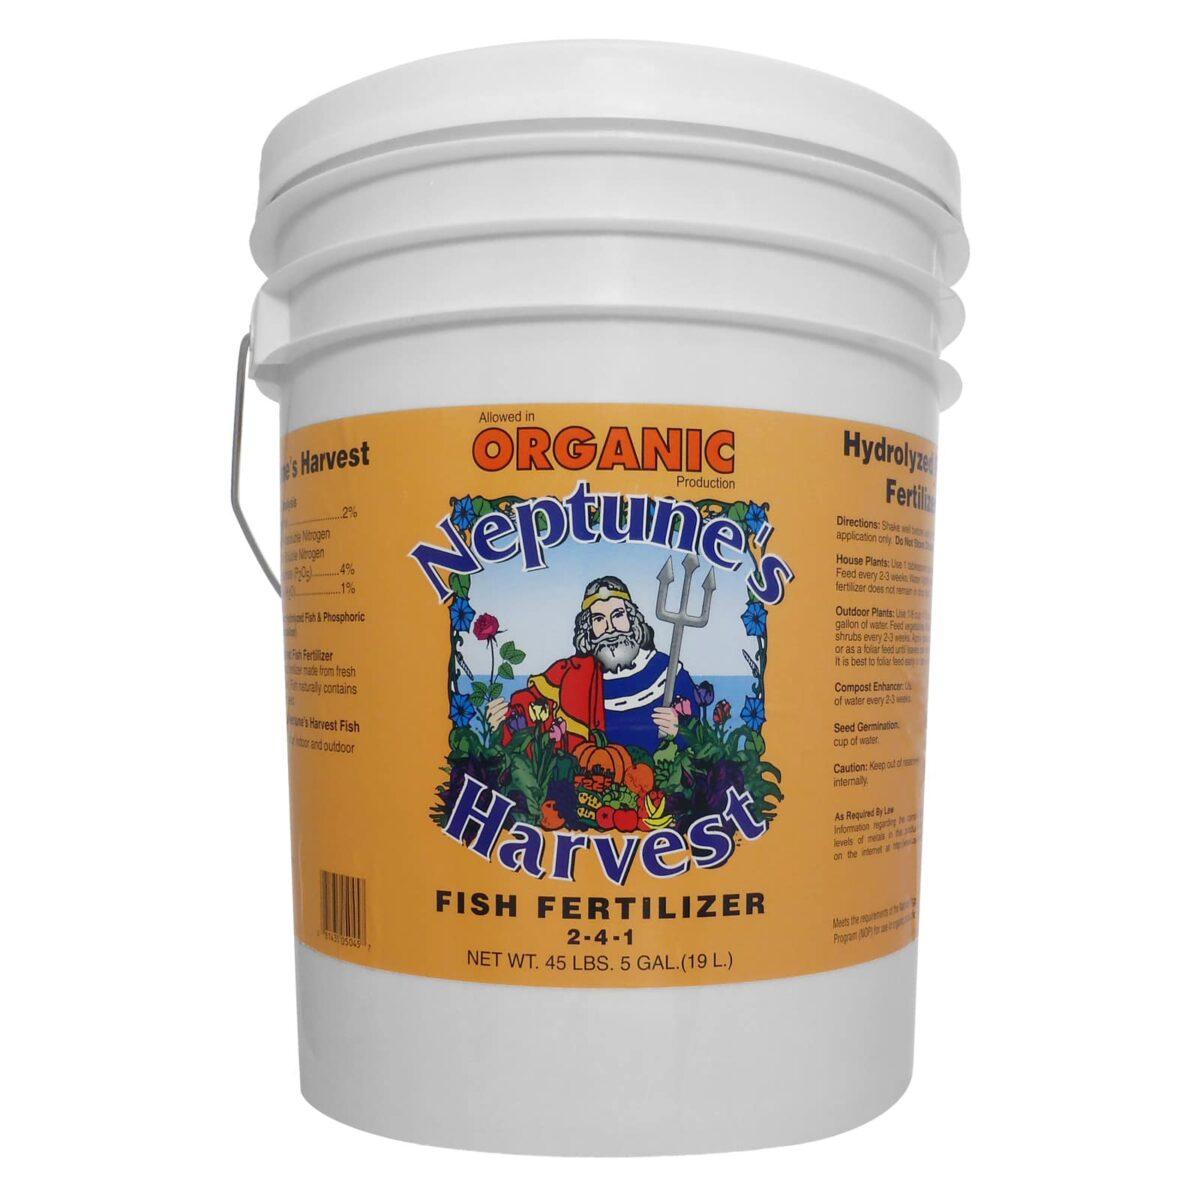 fish fertilizer